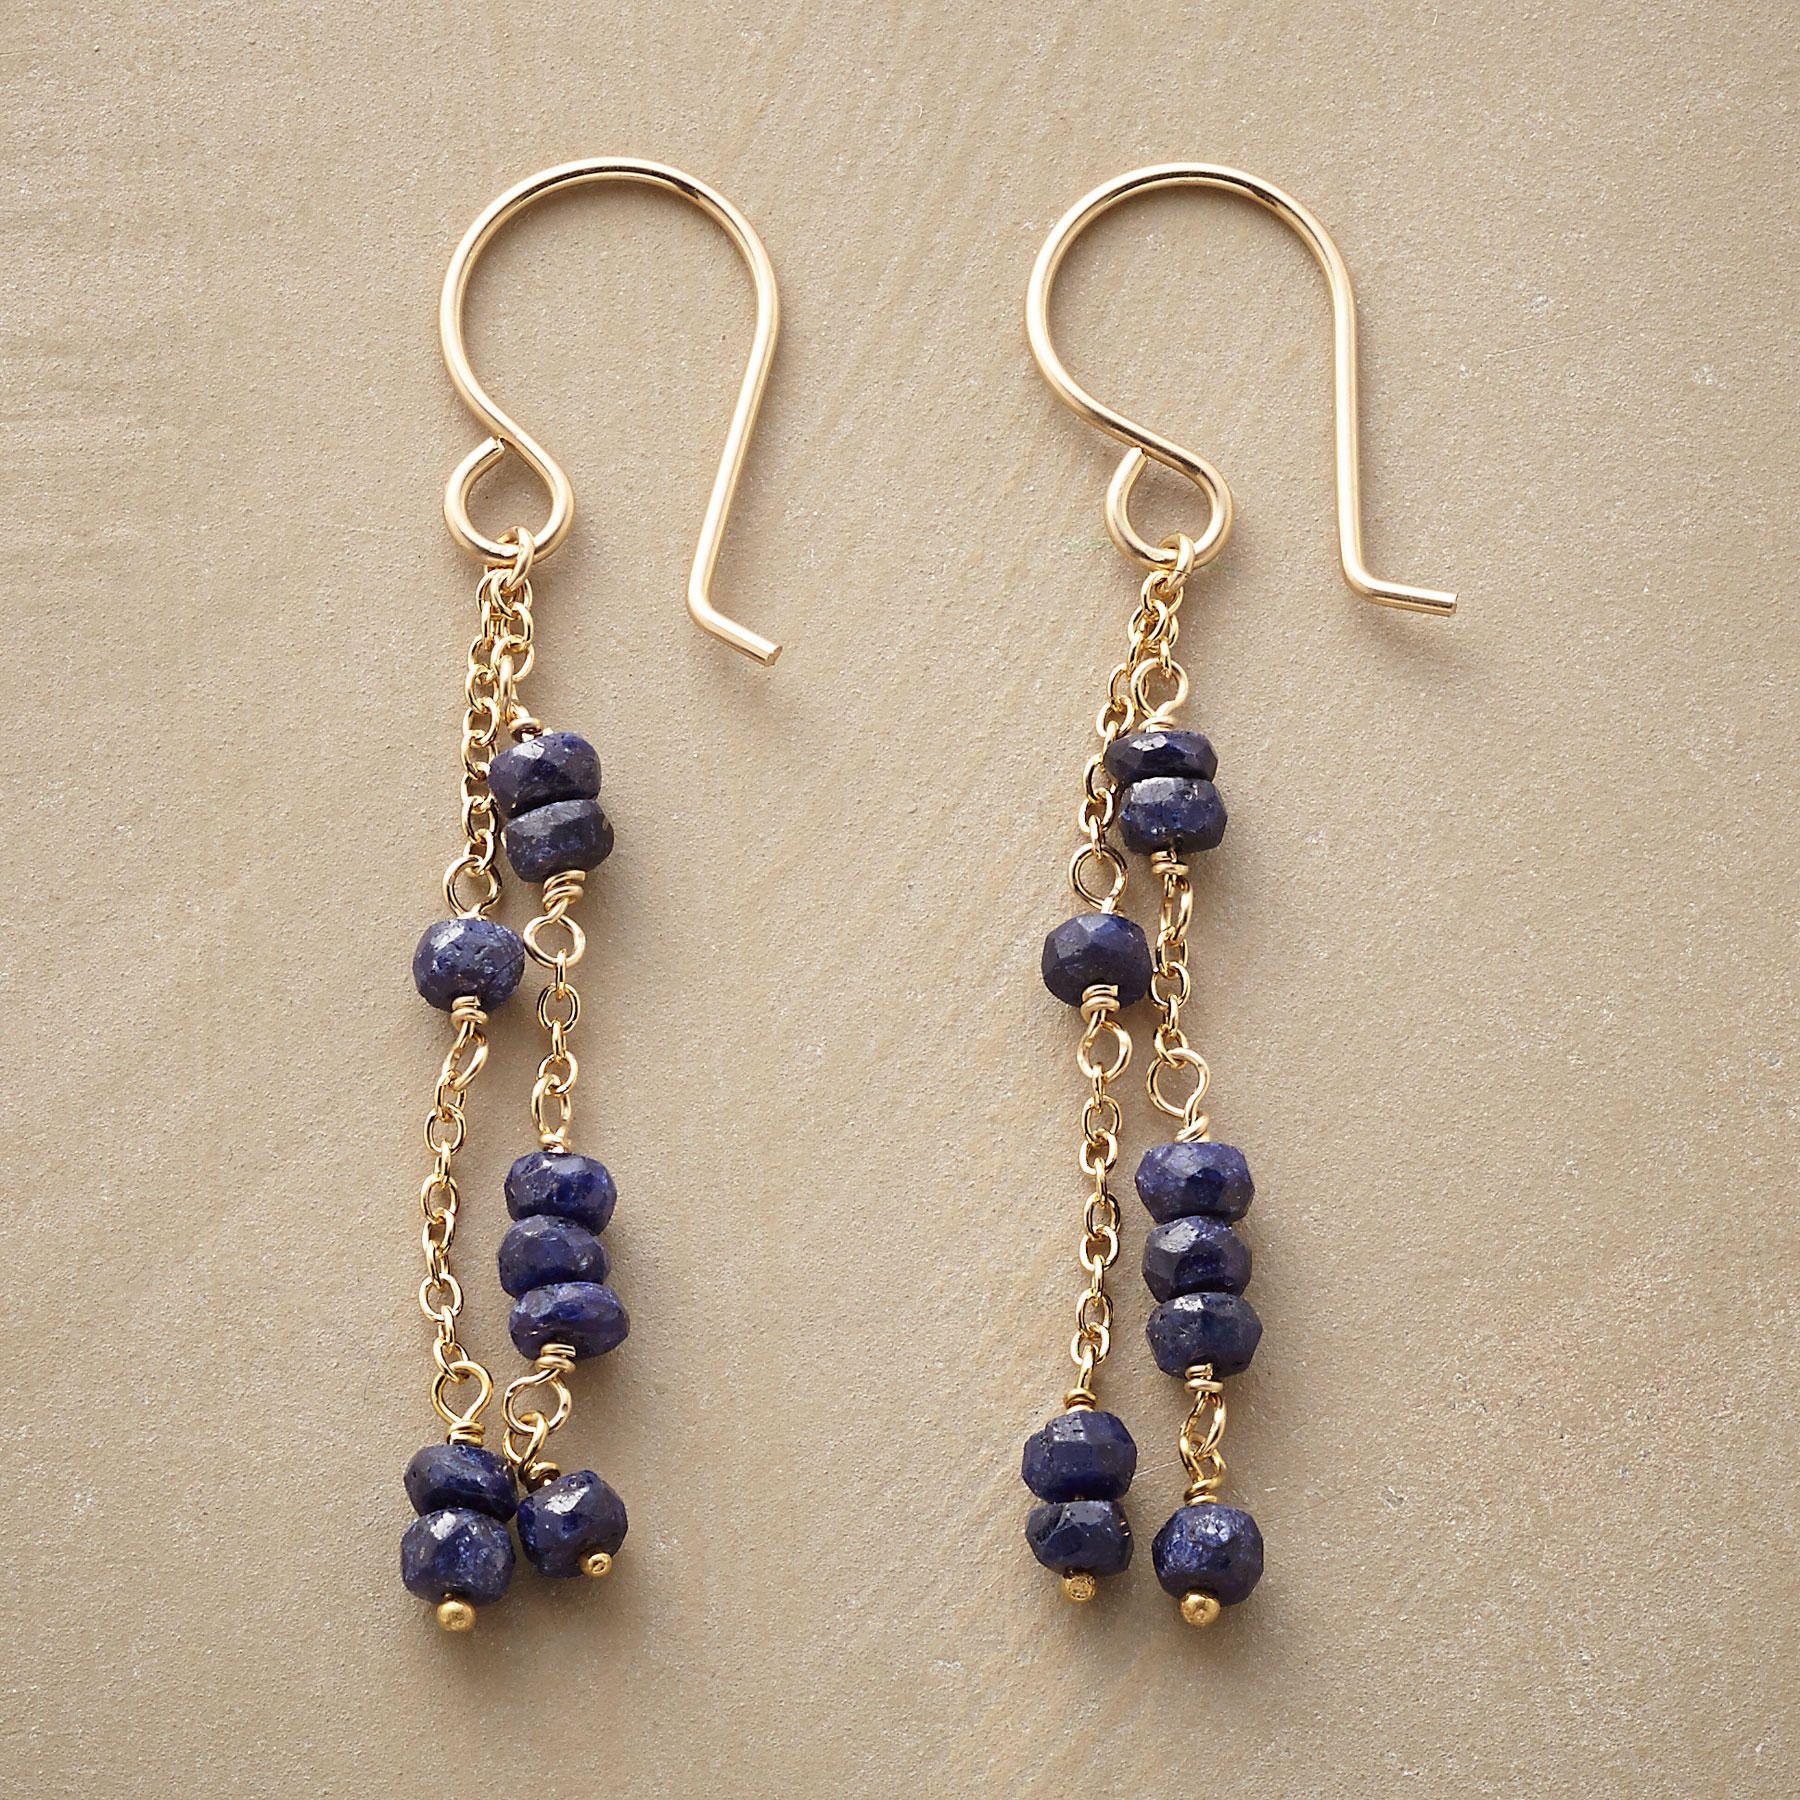 RANDOM SAPPHIRE EARRINGS -- Finding harmony in asymmetry, sapphires ...